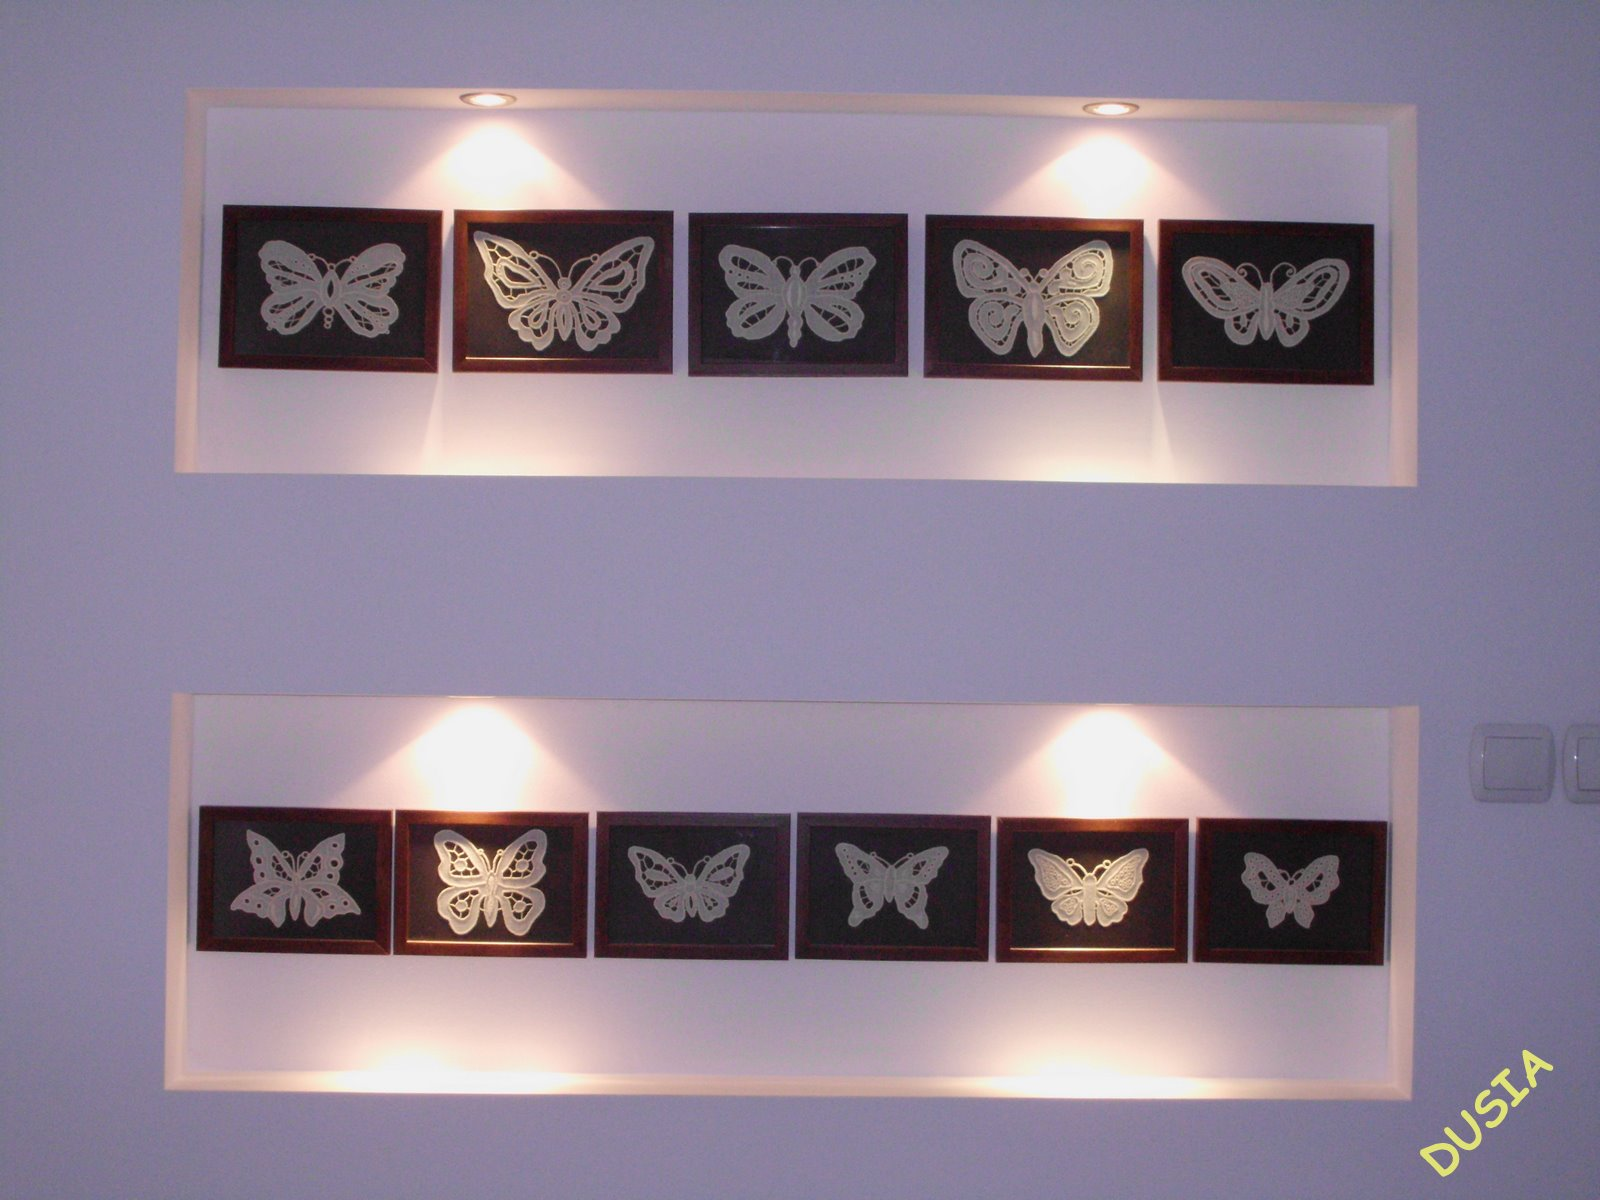 Motyle w ramkach